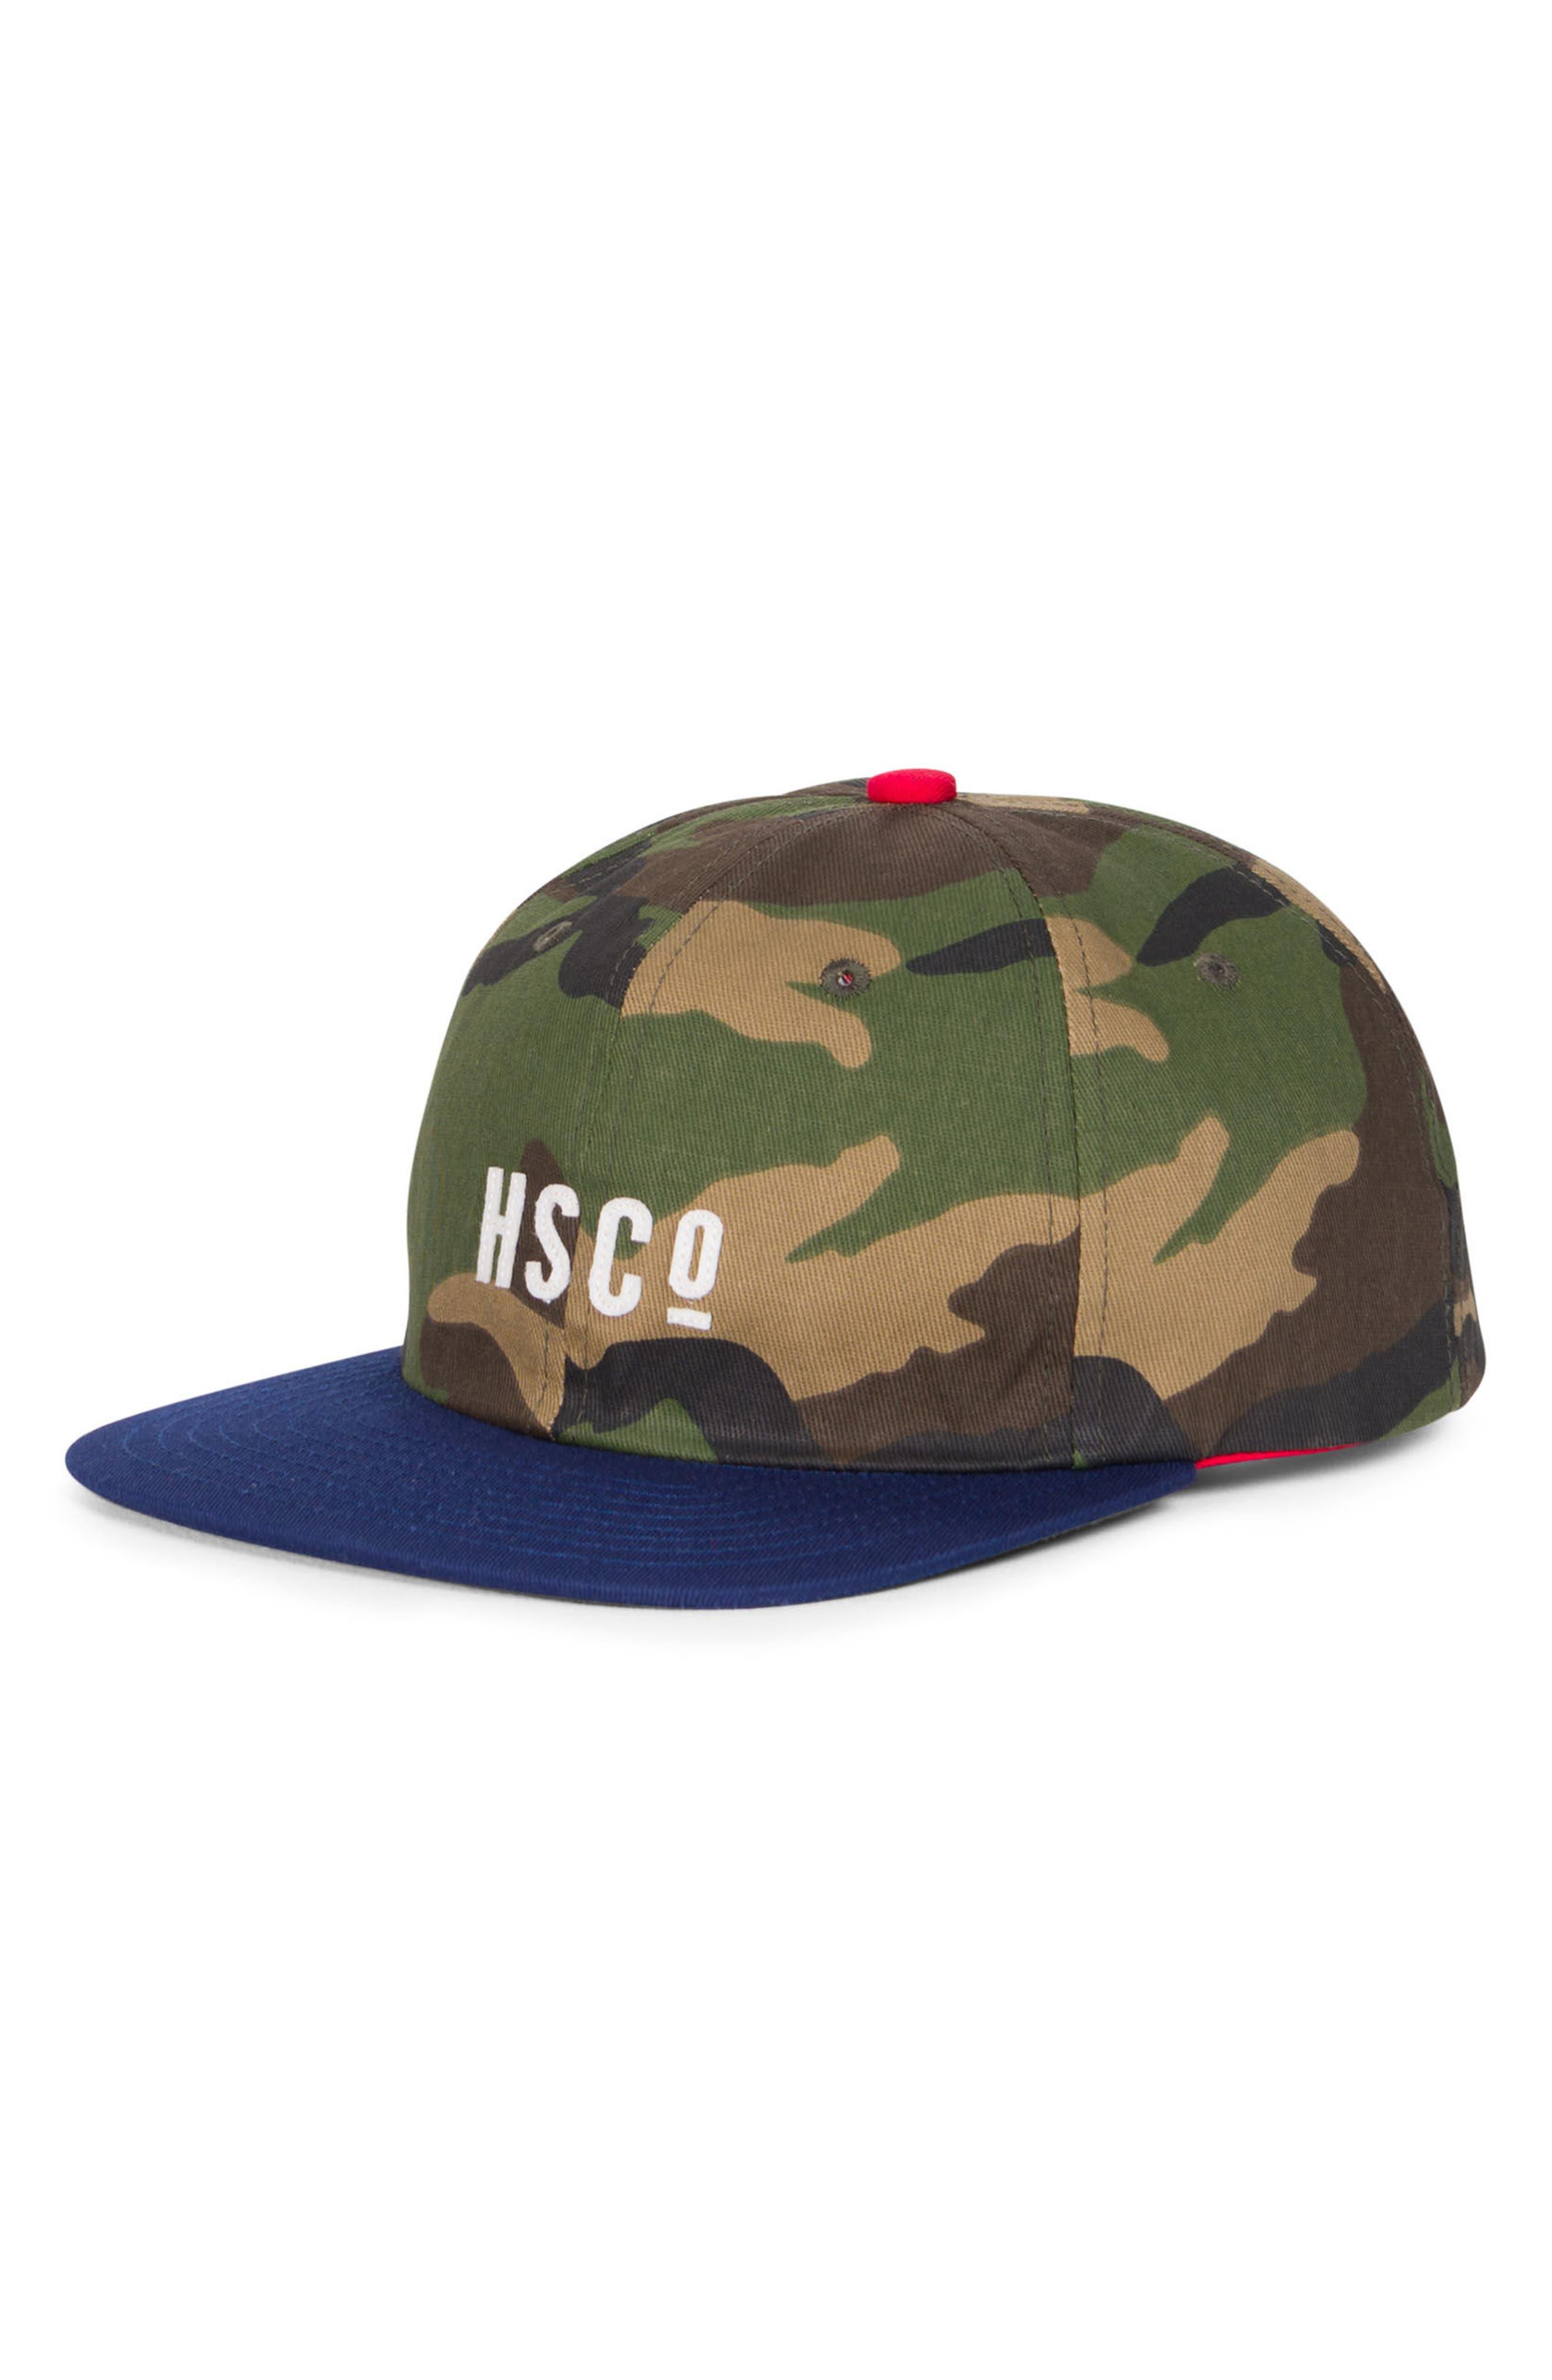 Main Image - Herschel Supply Co. Mosby Camo Snapback Baseball Cap